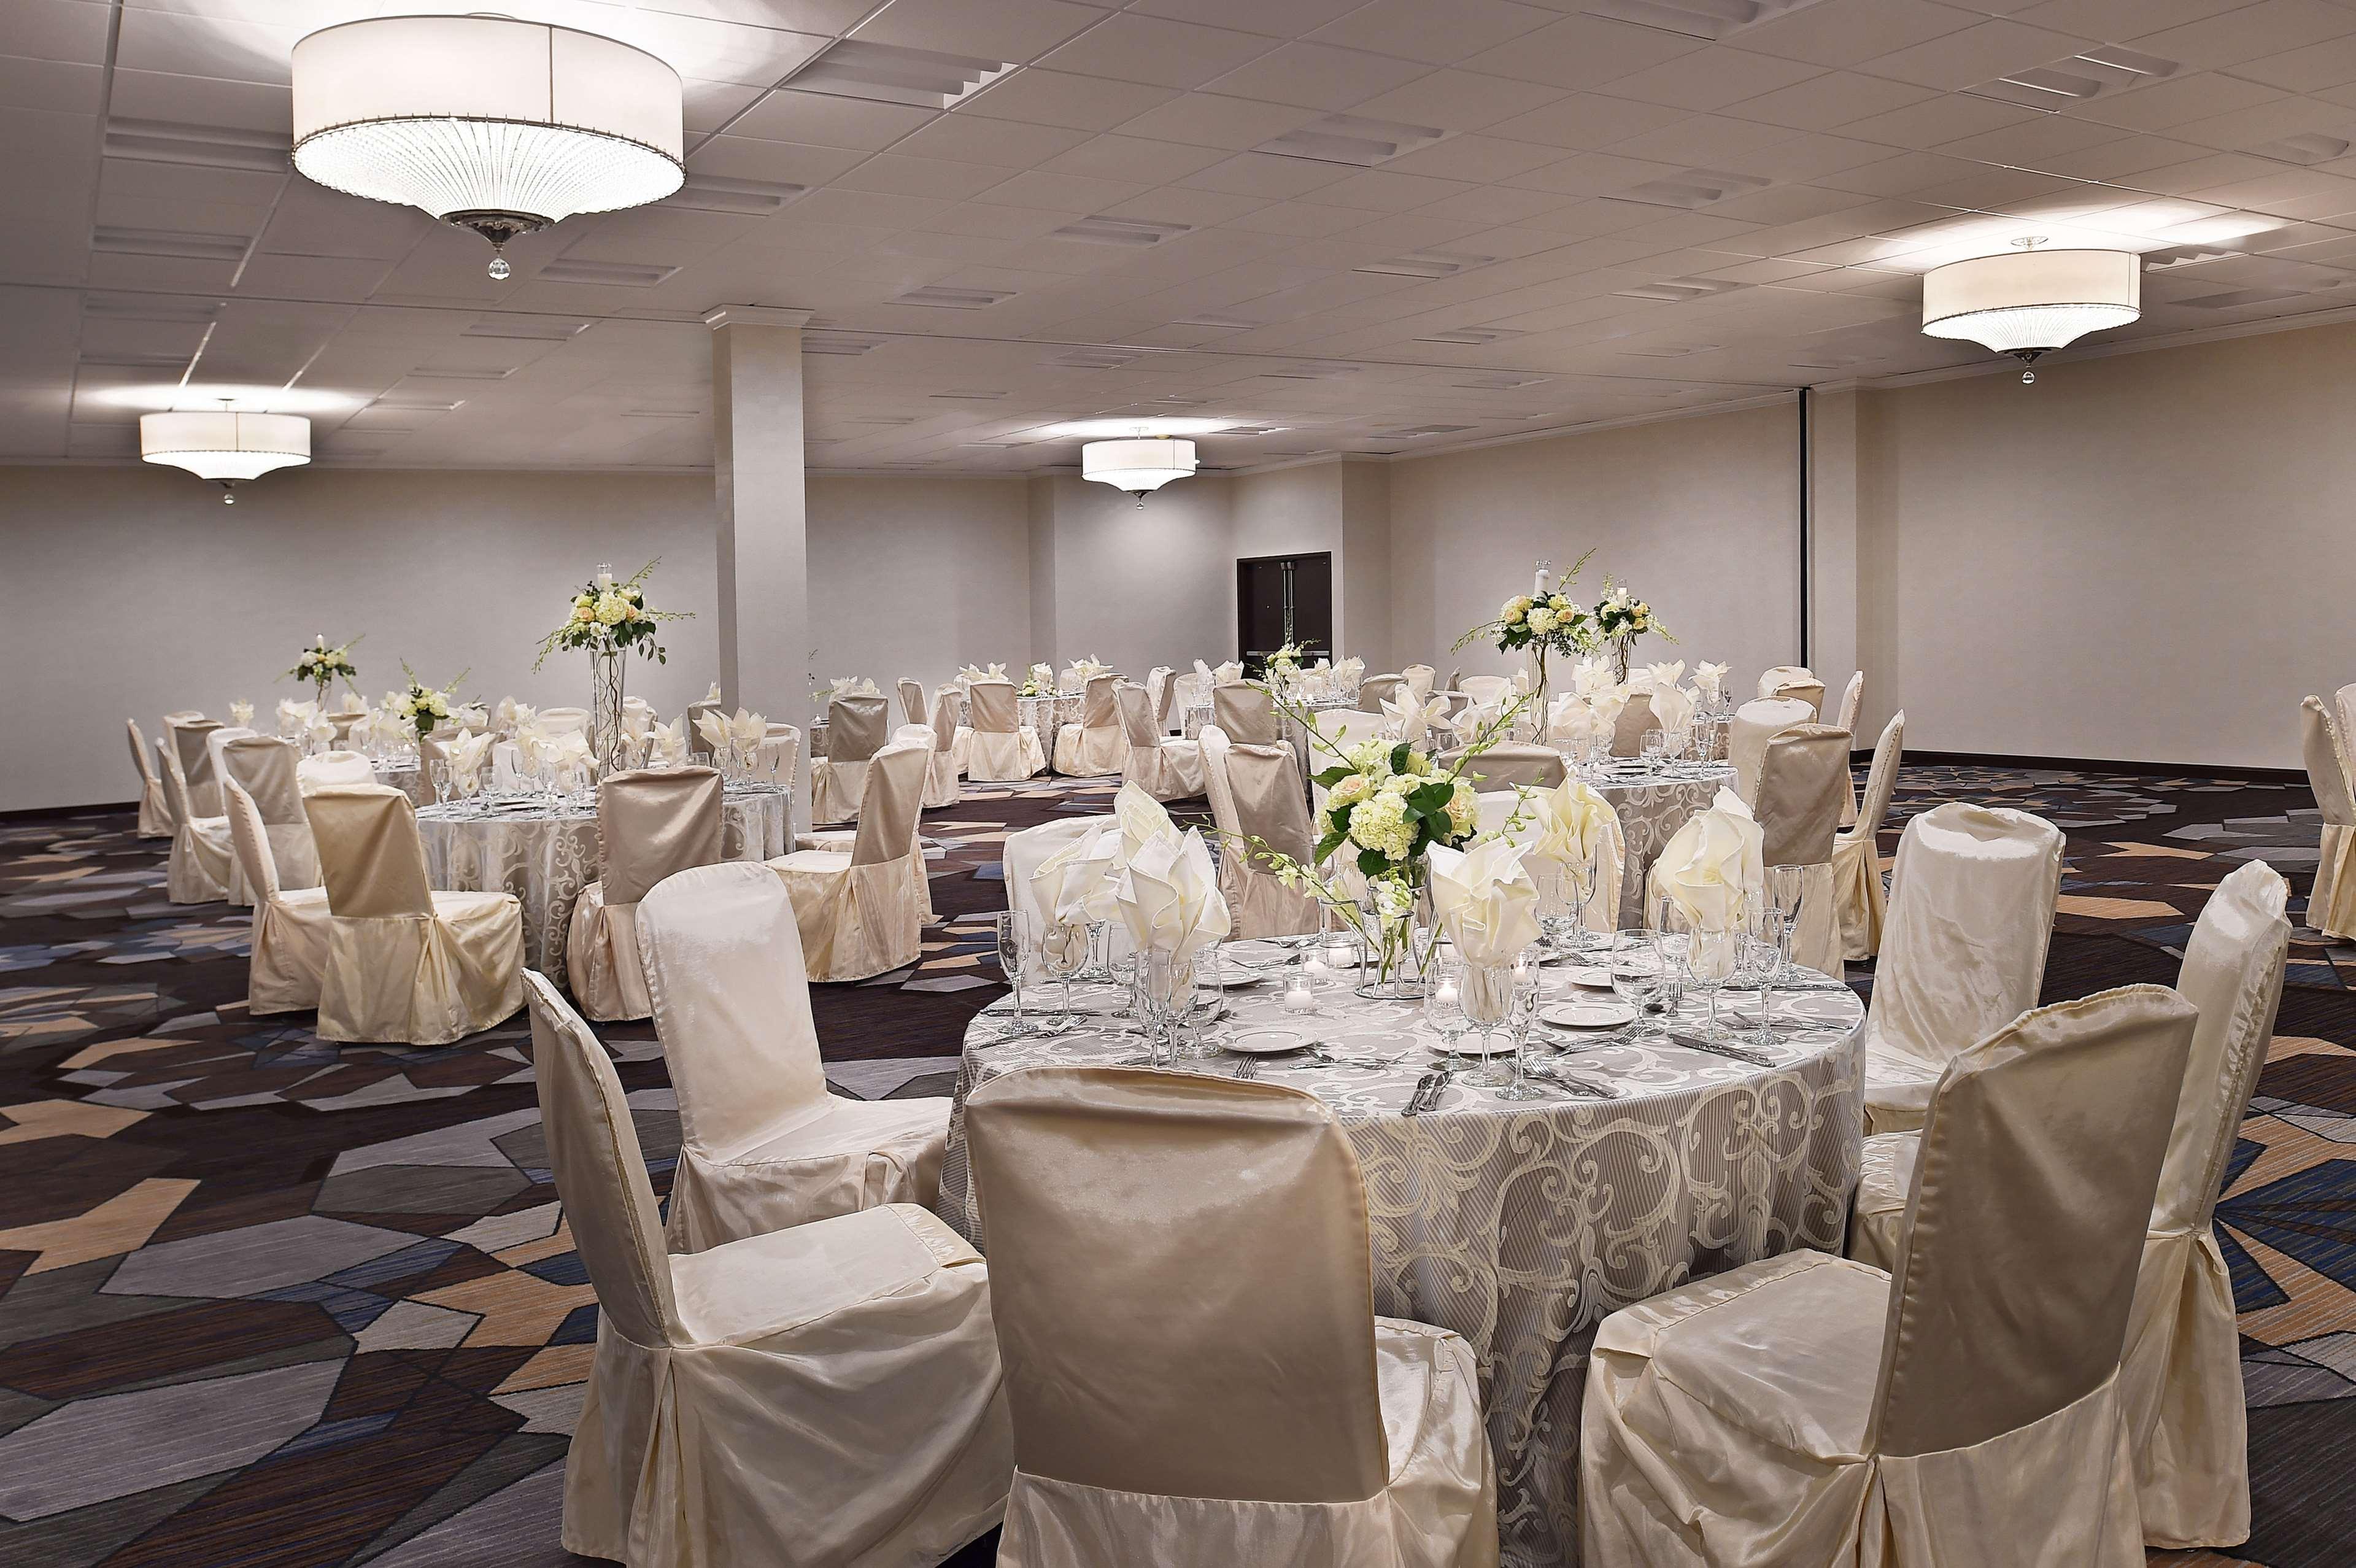 Sheraton Westport Plaza Hotel St. Louis image 16